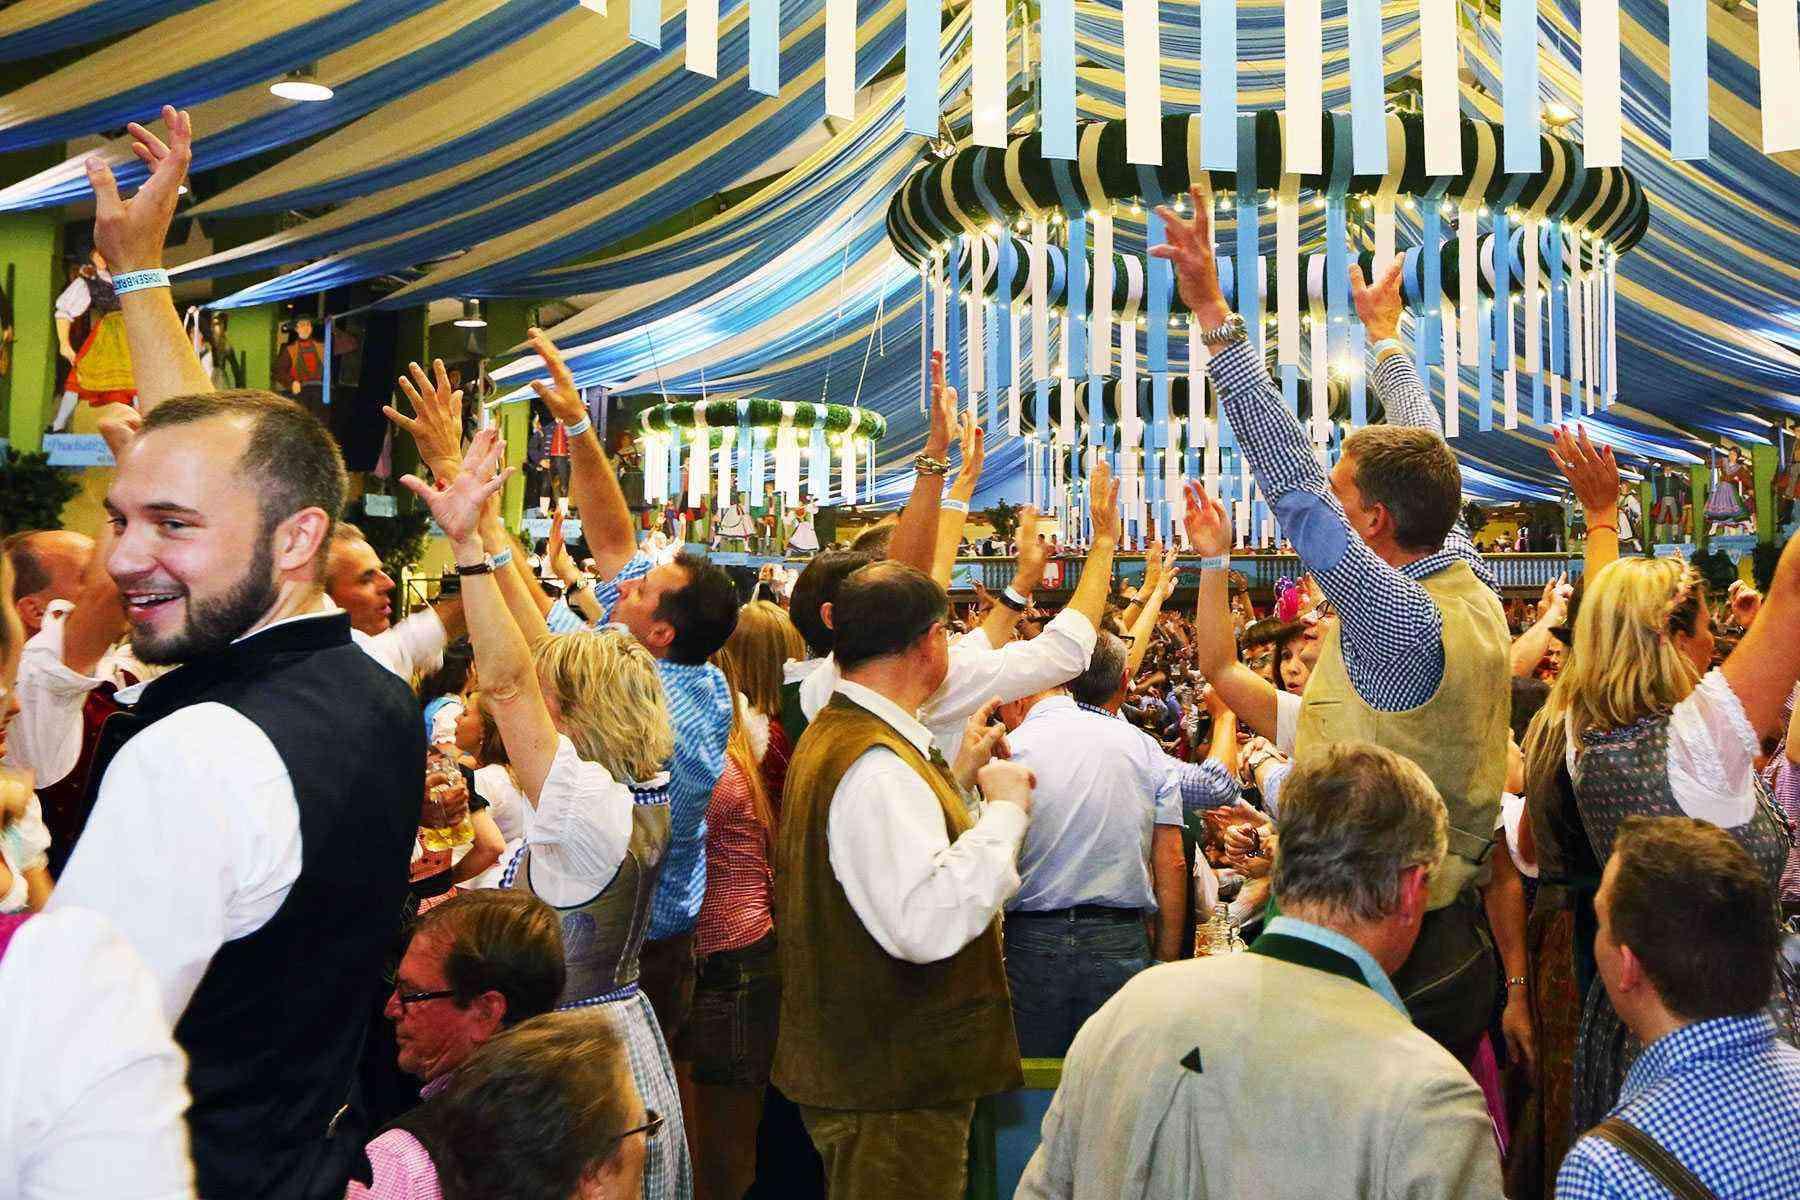 Surviving-Oktoberfest-Crowds-21